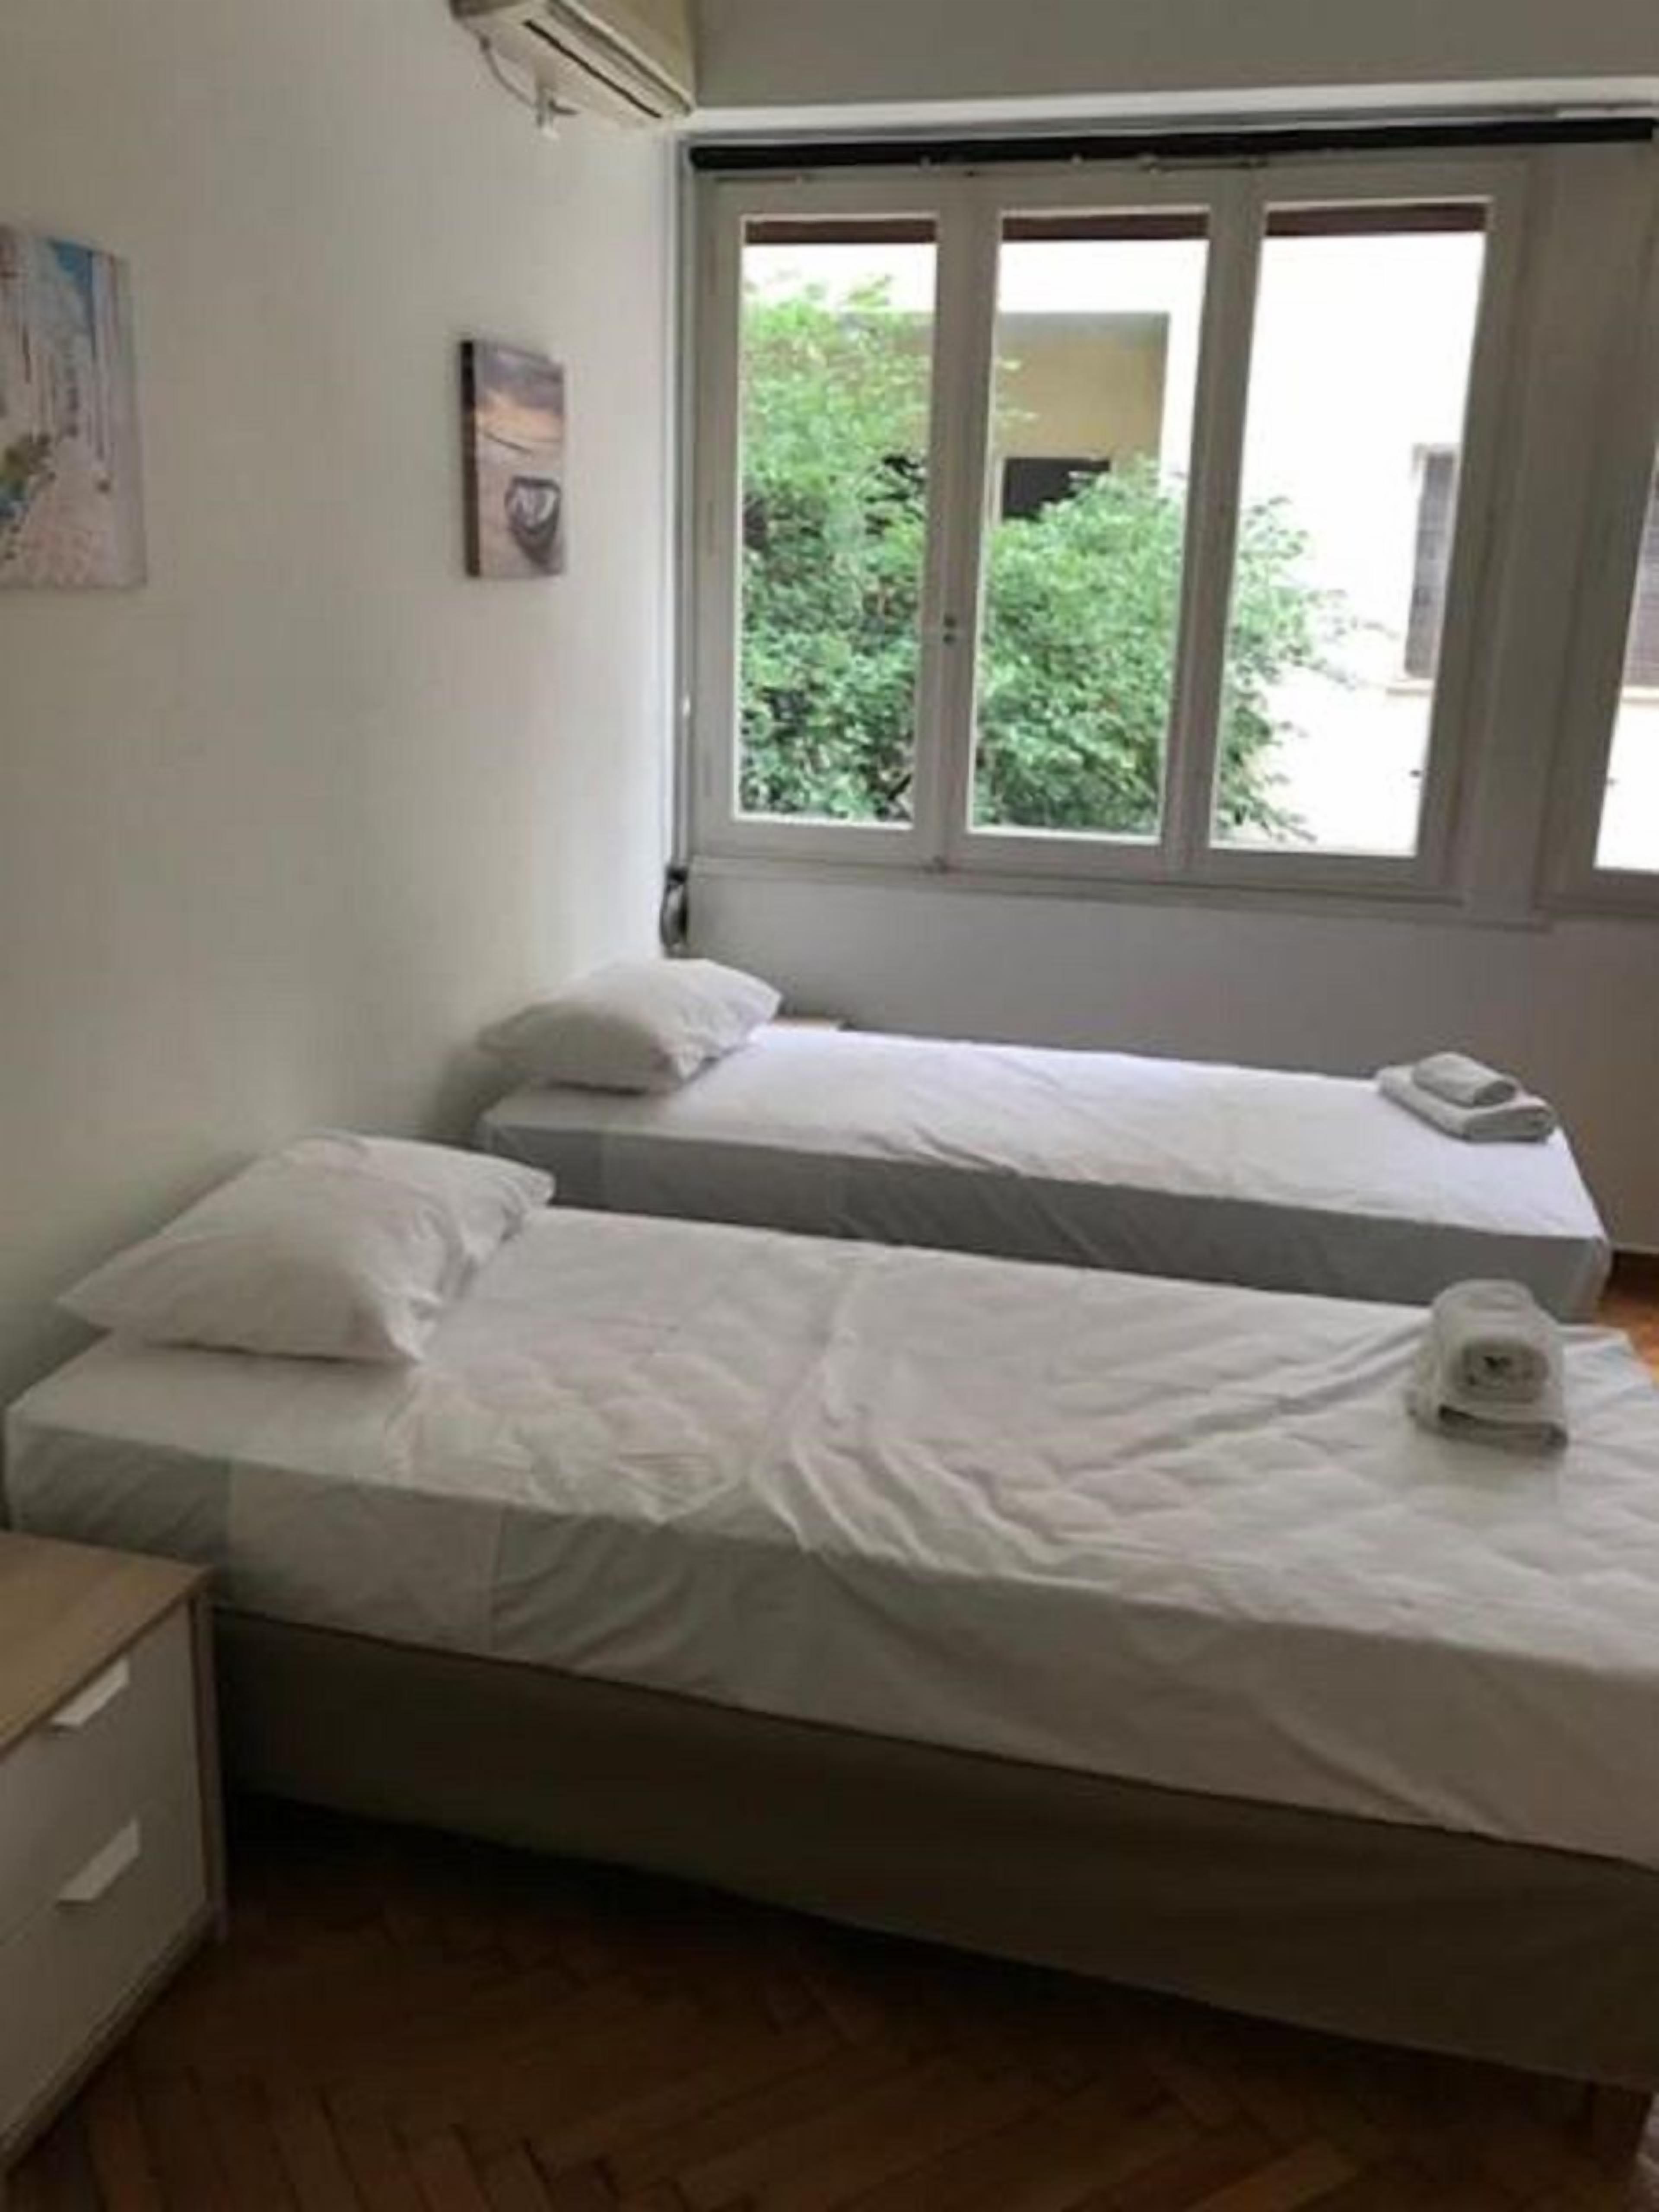 Kaniggos Two Bedroom Big Apartment